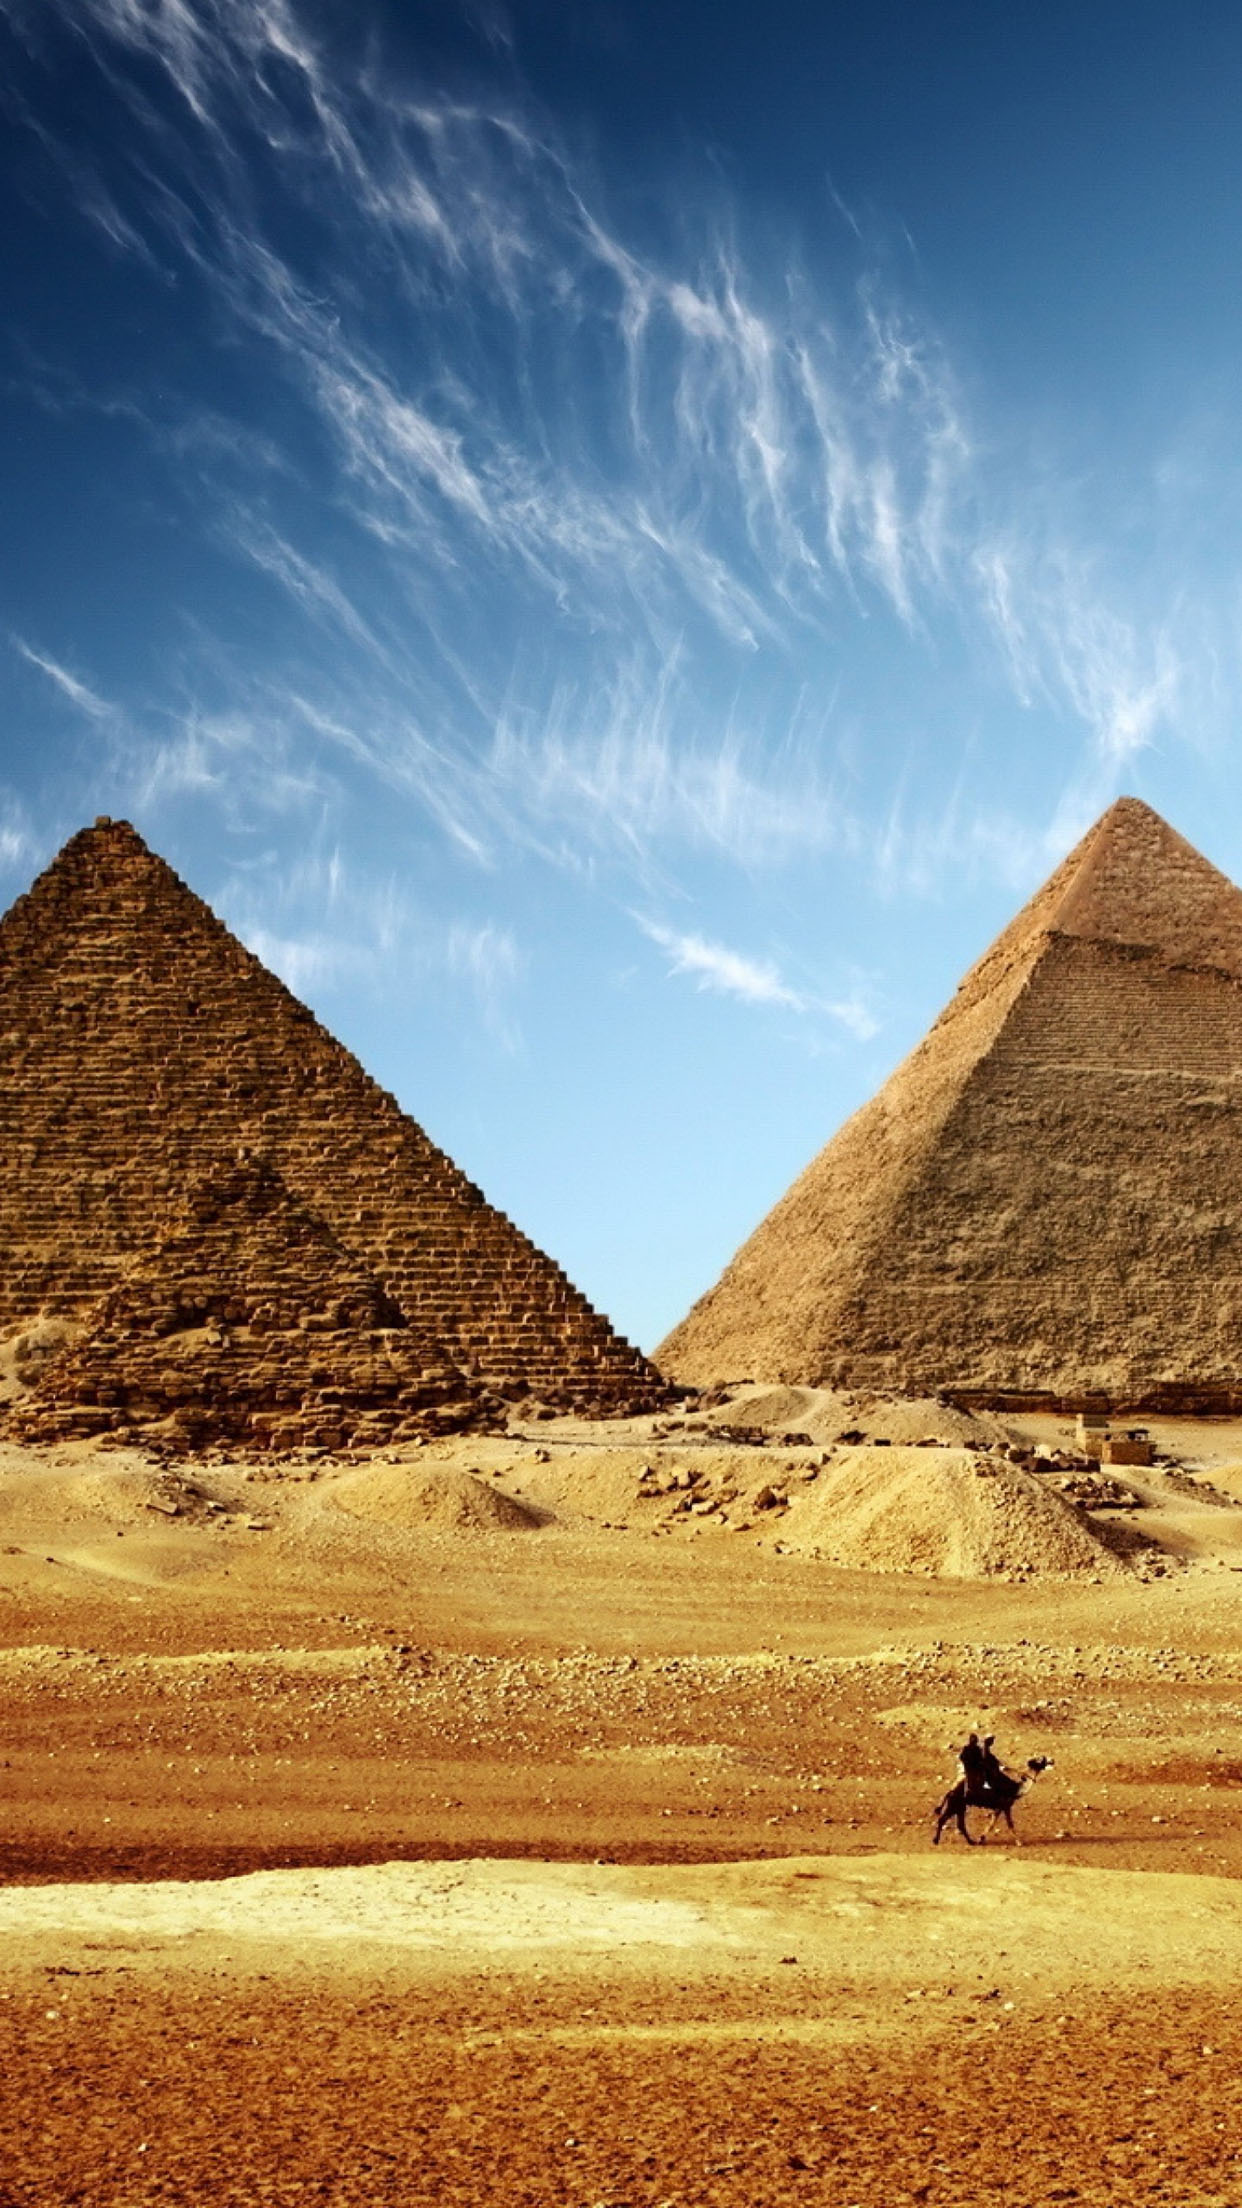 Pyramide Pyramide 3 3Wallpapers iPhone Parallax Pyramide 3